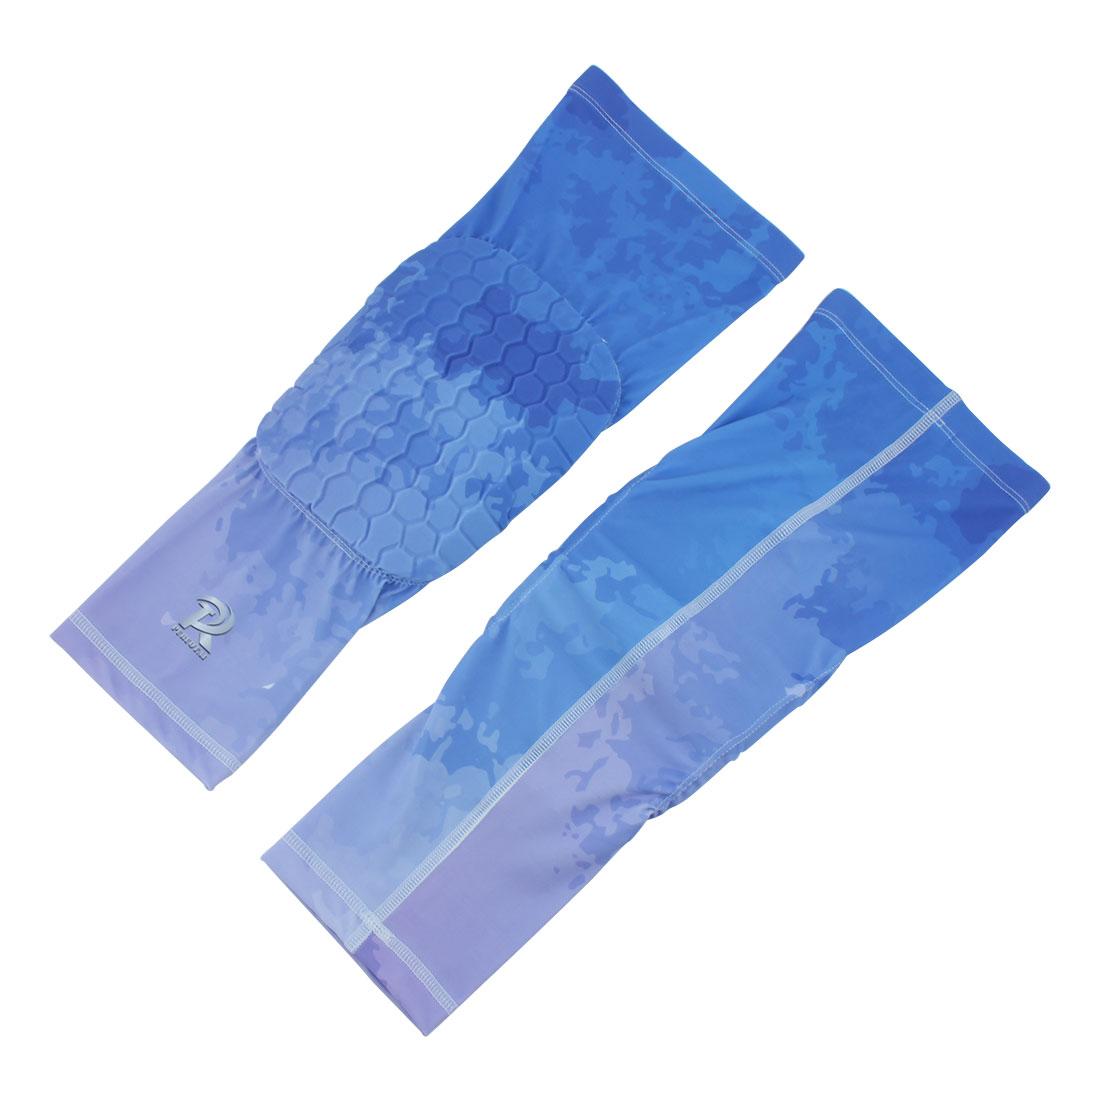 Sports Knee Brace Leg Sleeve Wrap Support Blue #1 XL Pair